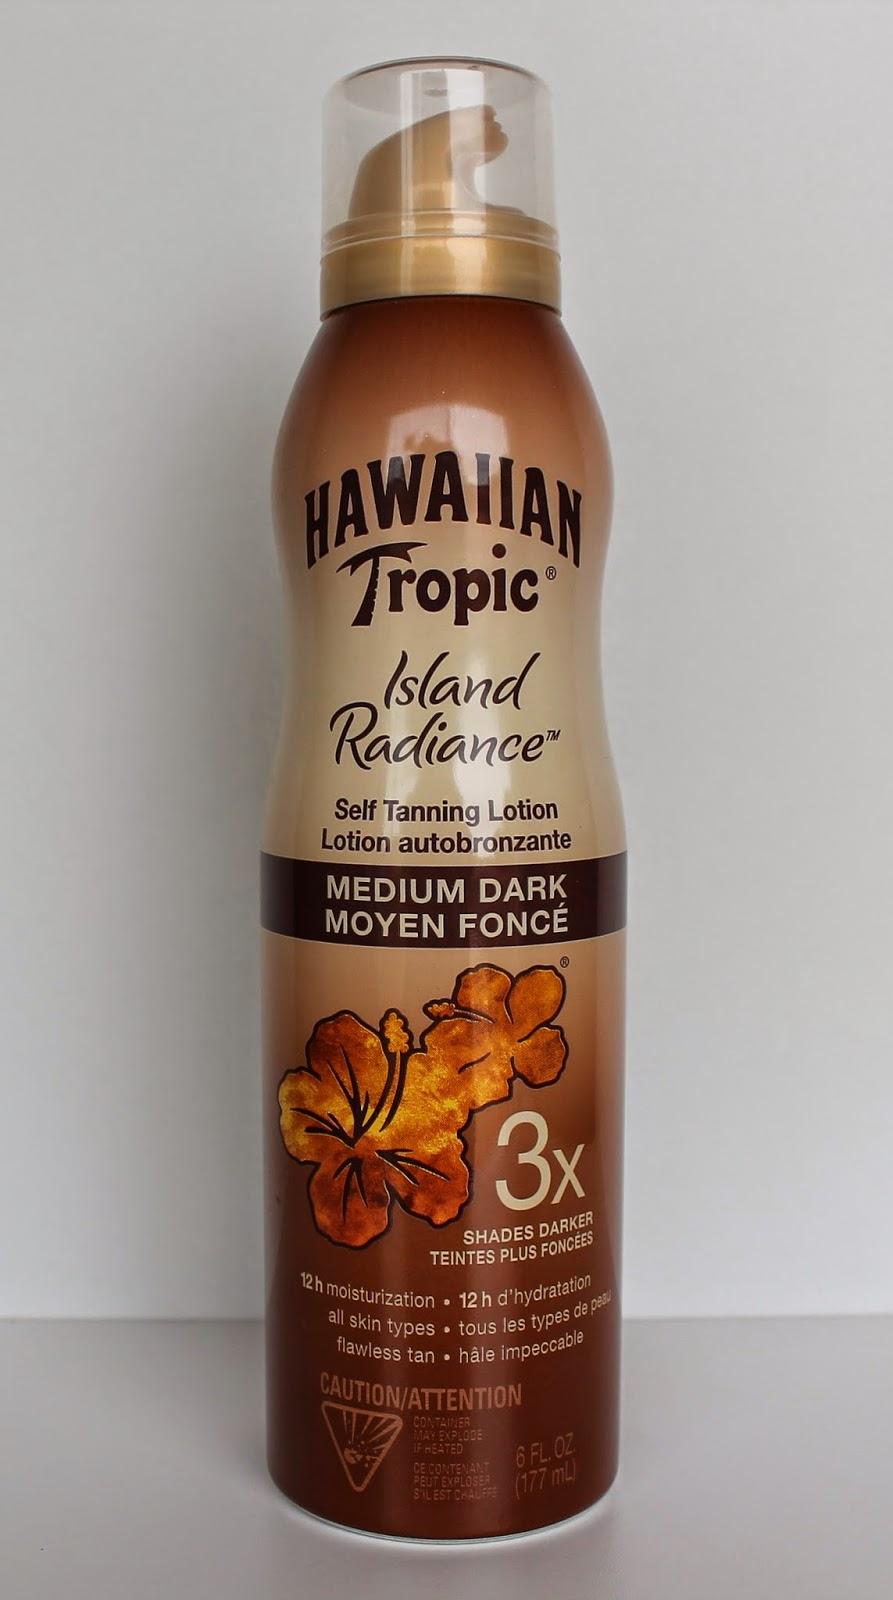 Autobronzant Hawaiian Tropic